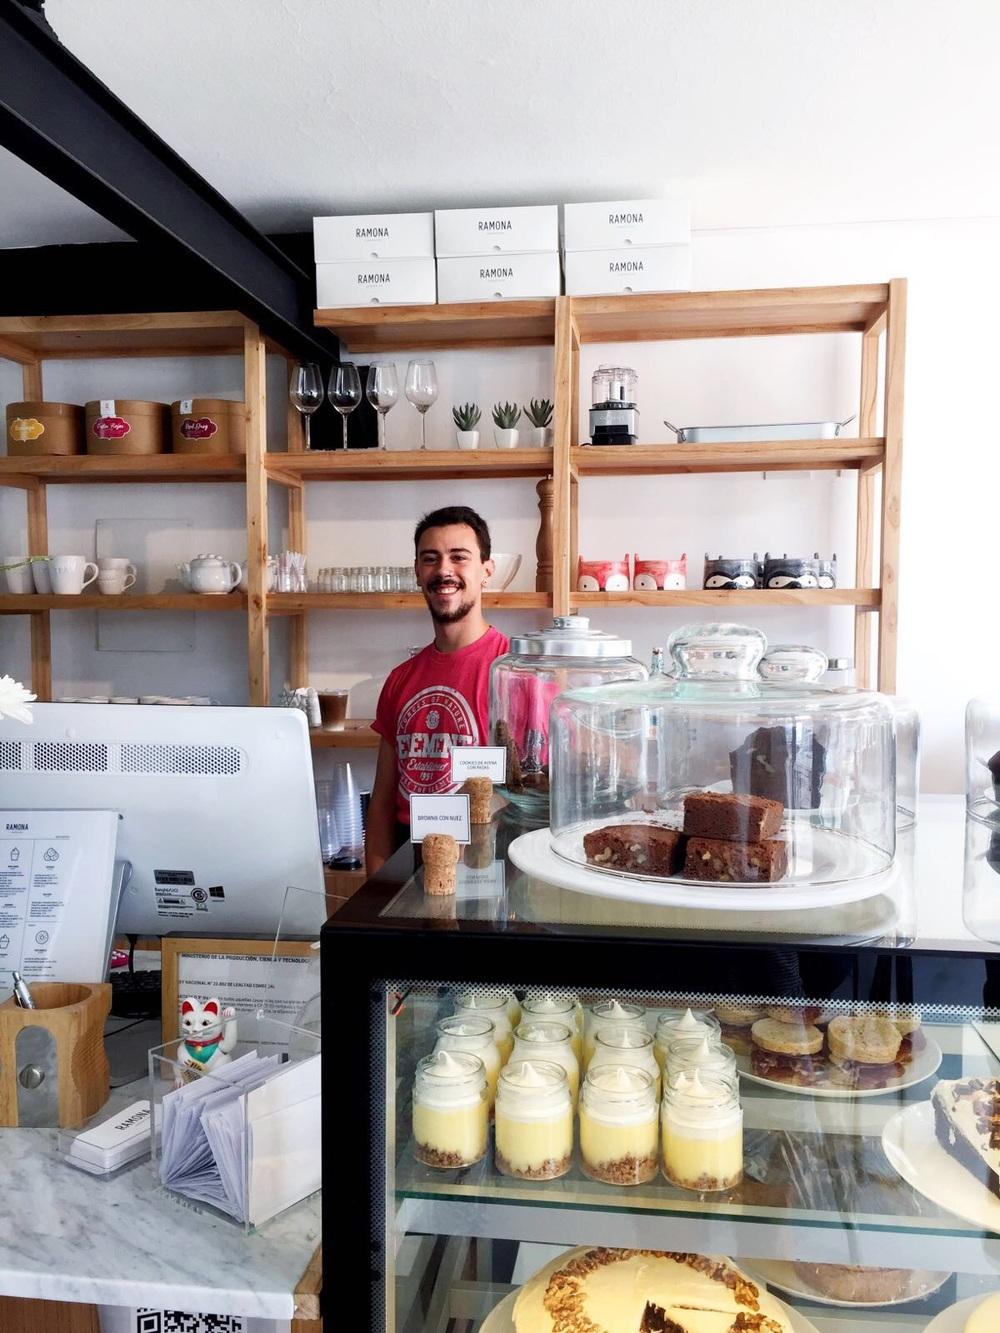 Ramona Bakehouse. My favorite coffee shop.